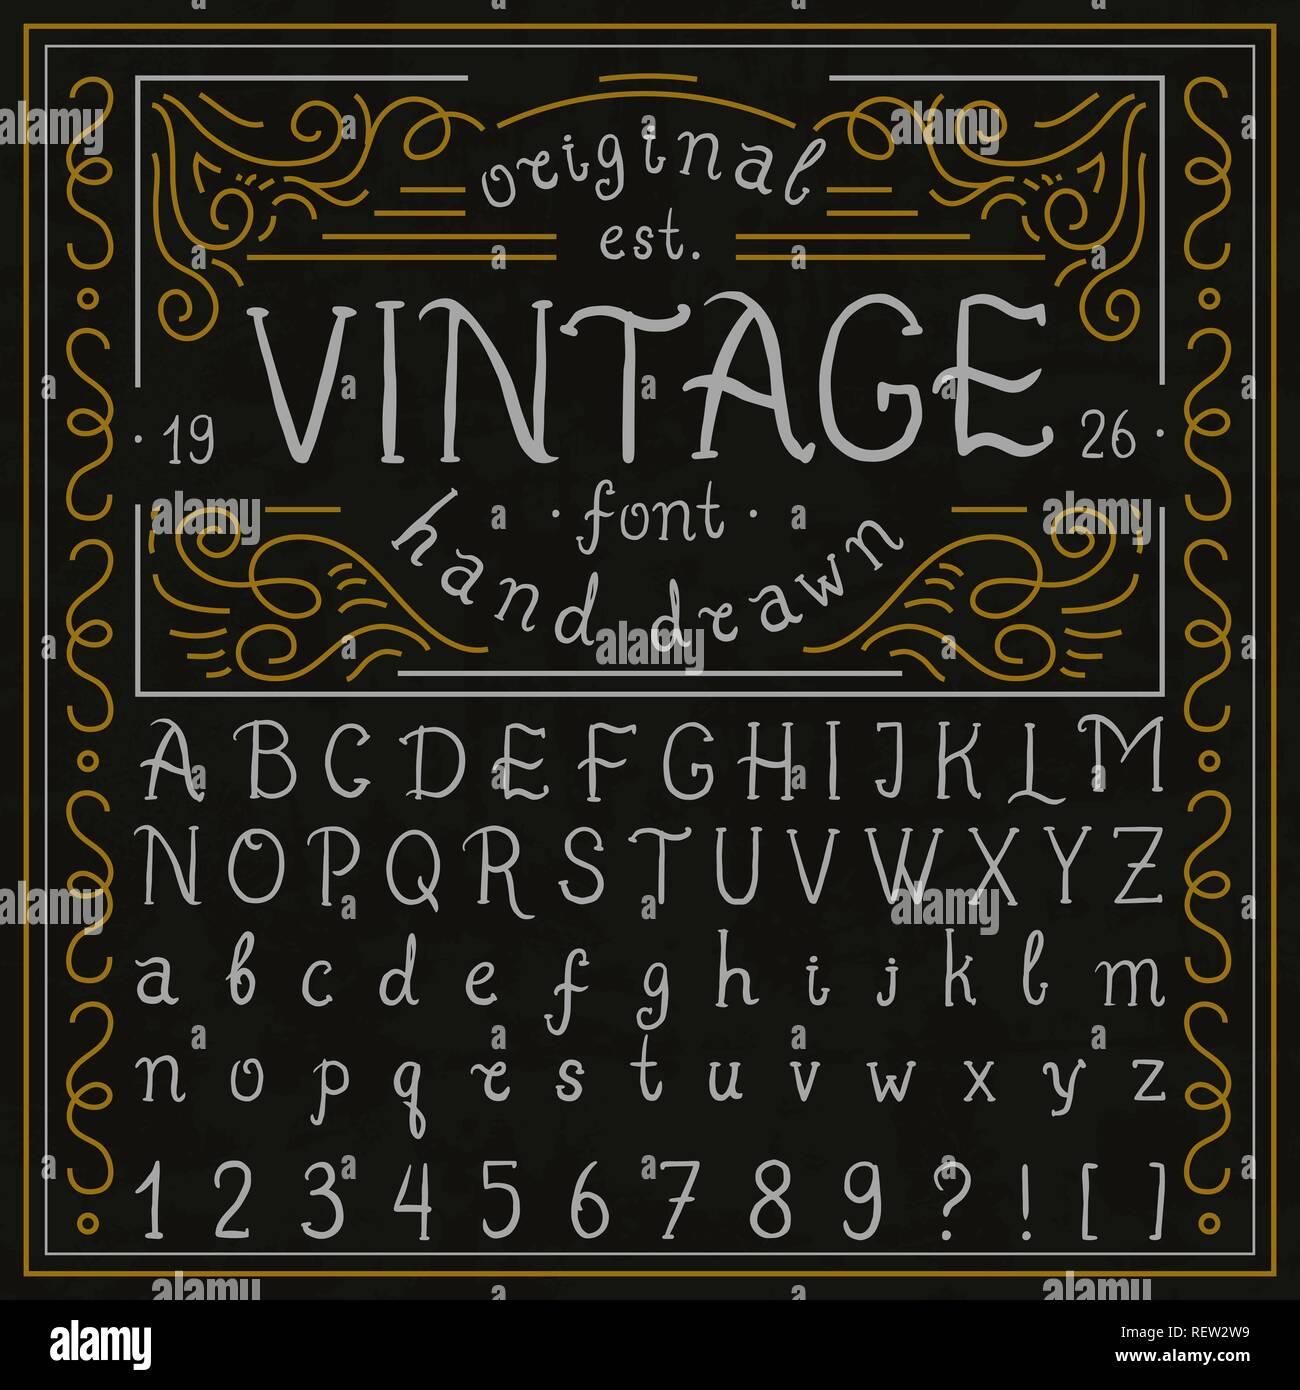 Vintage whiskey font  Handwritten alphabet letters  Decorative Sign